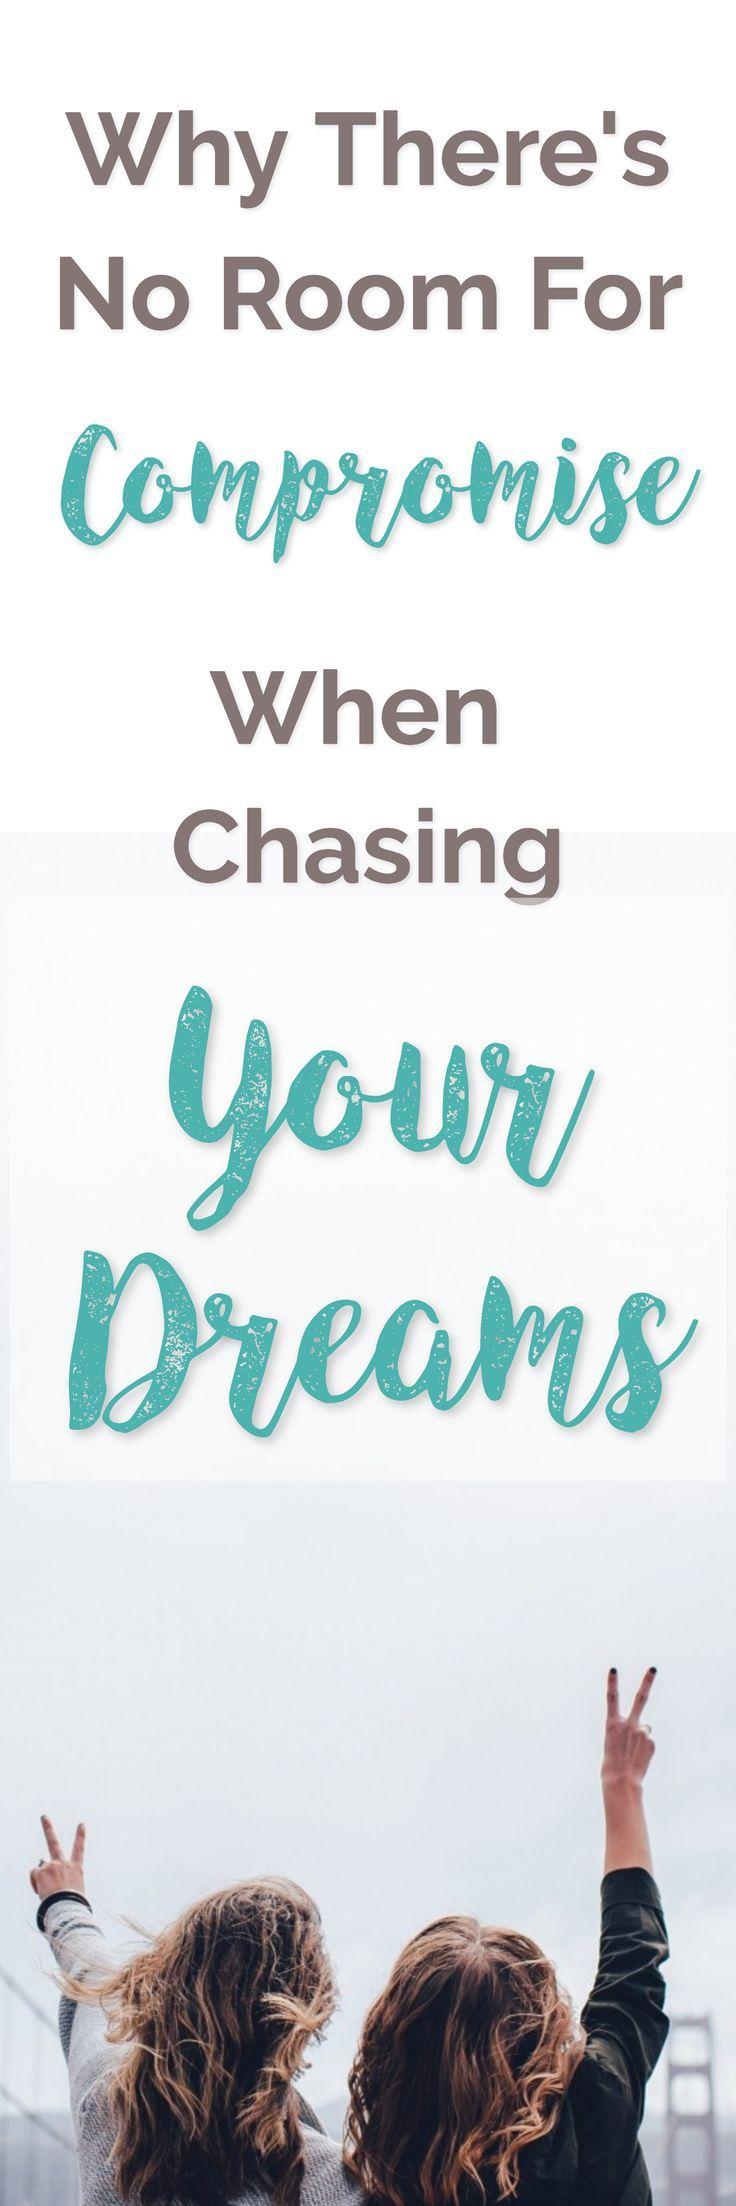 speech on setting goals in life